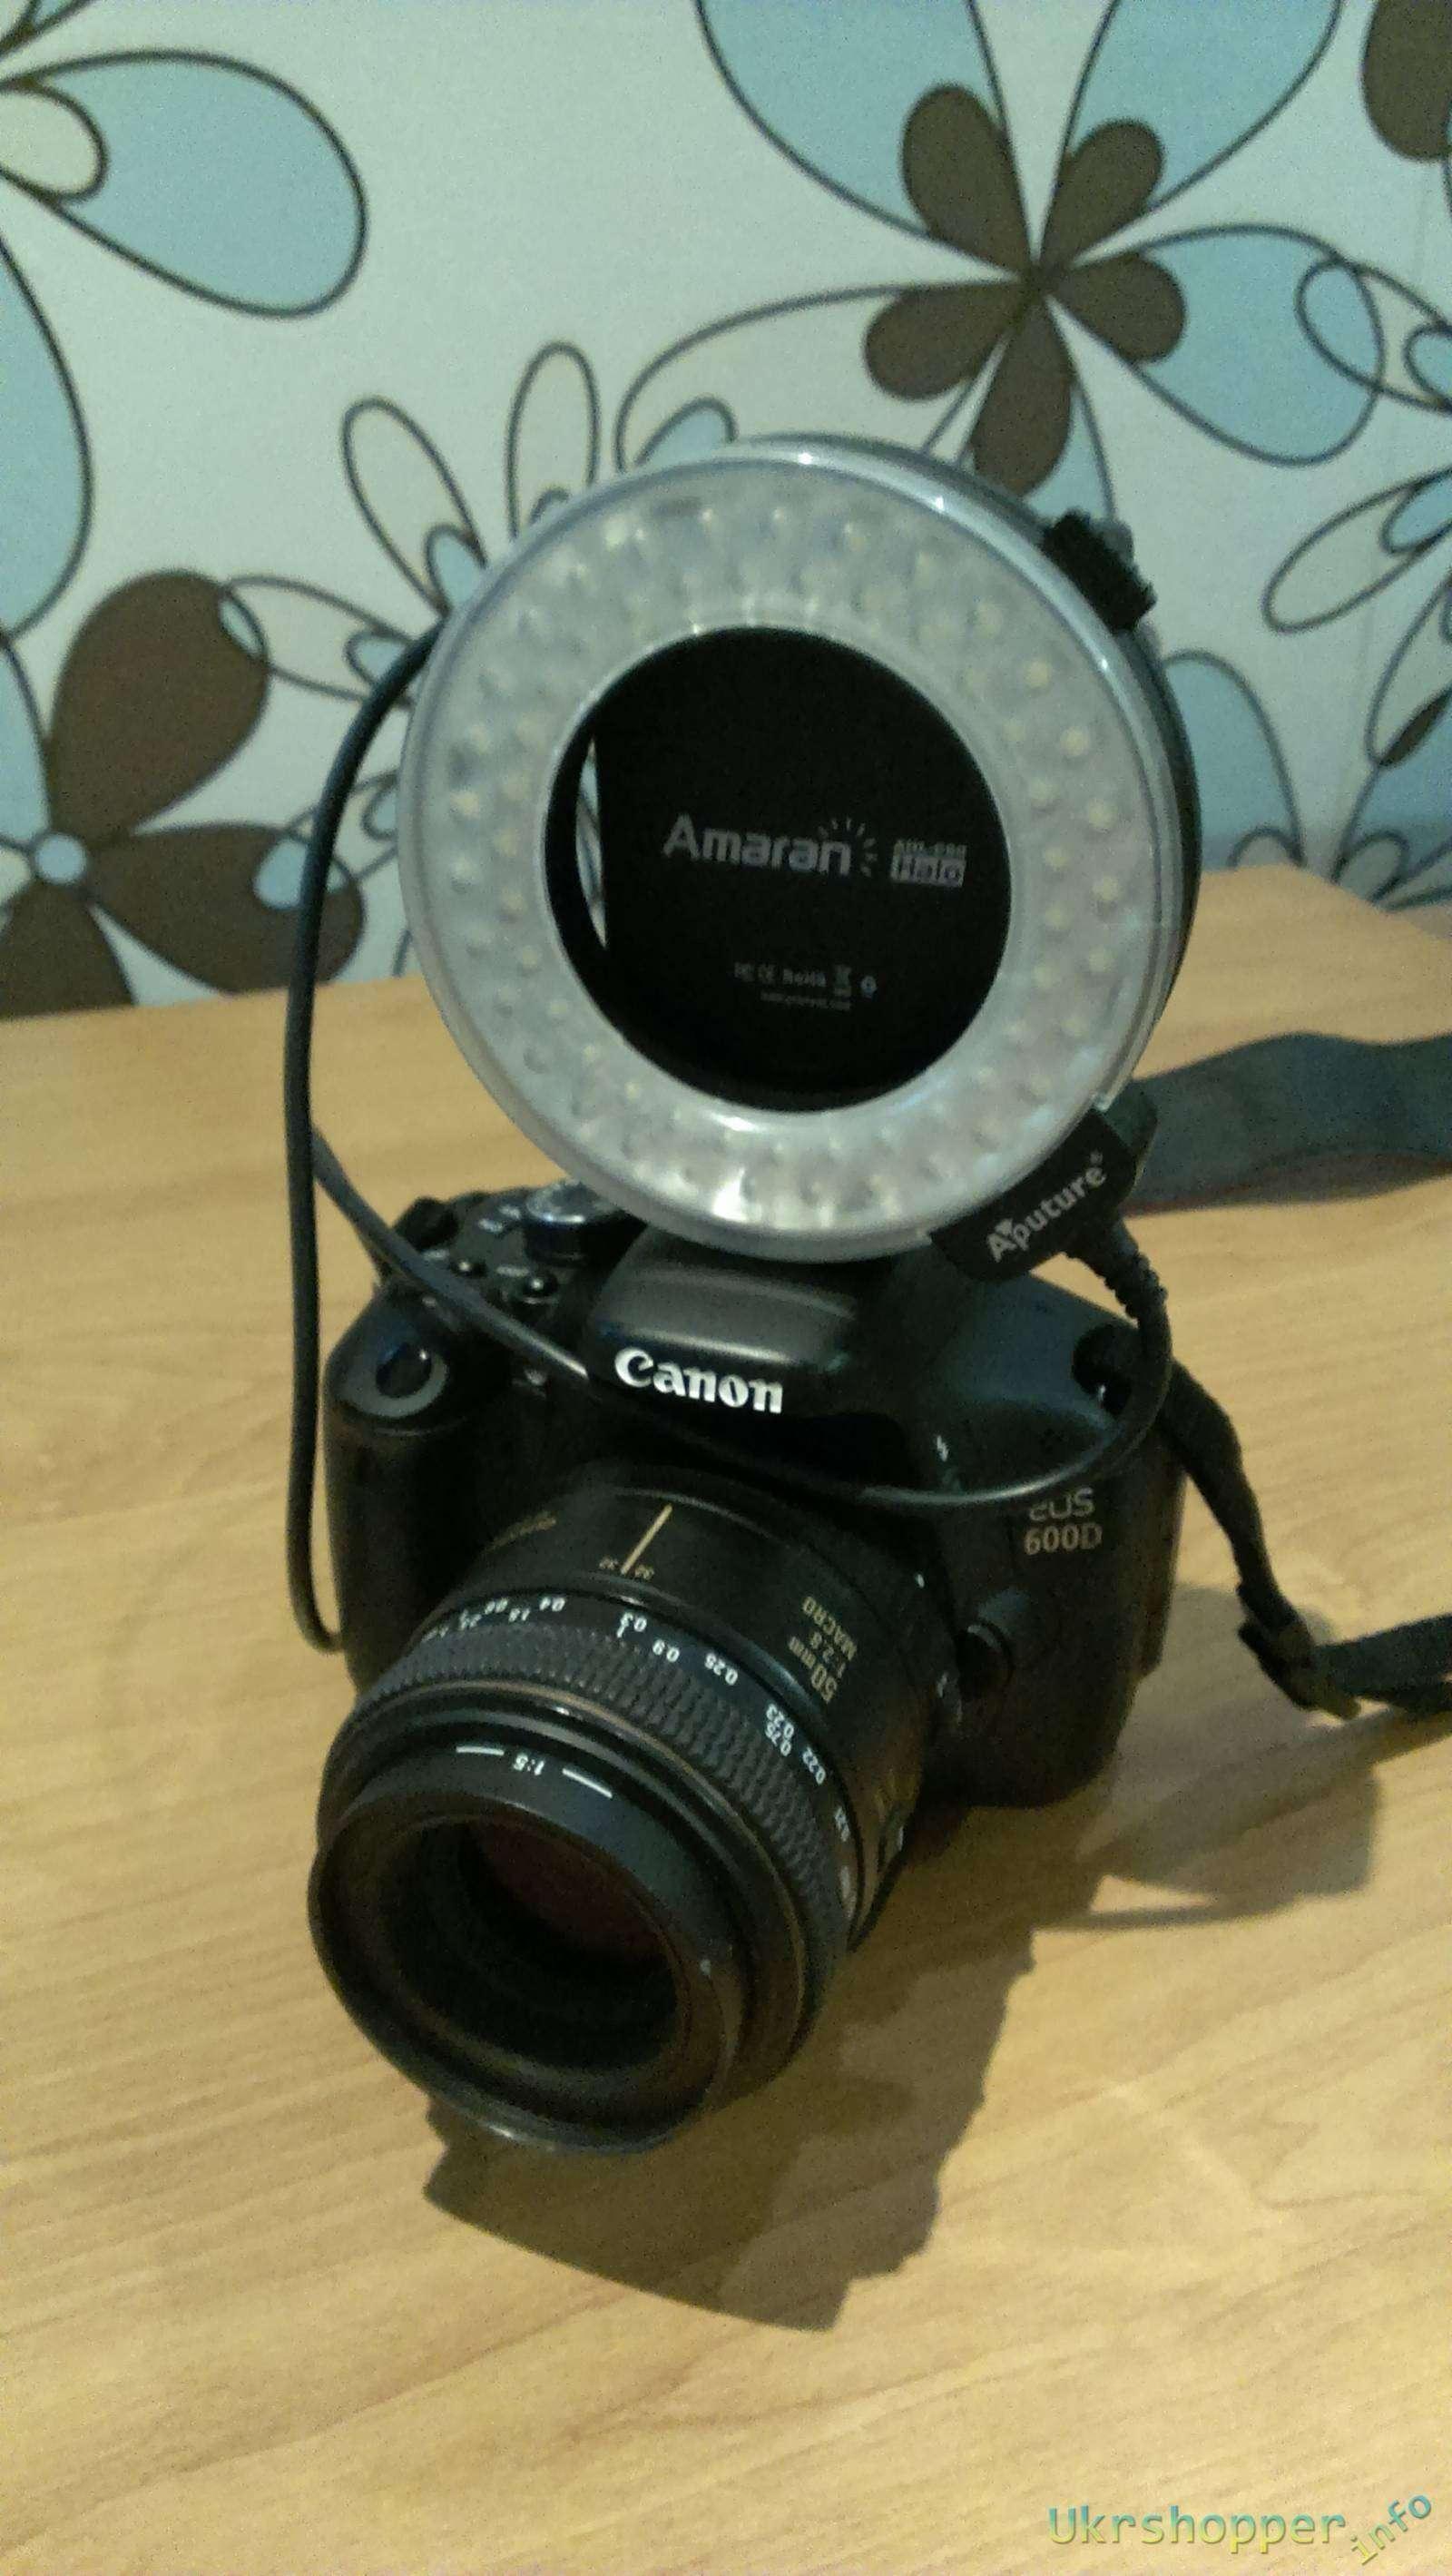 Aliexpress: Кольцевая вспышка для макросъемки Aputure Amaran Halo LED AHL-C60